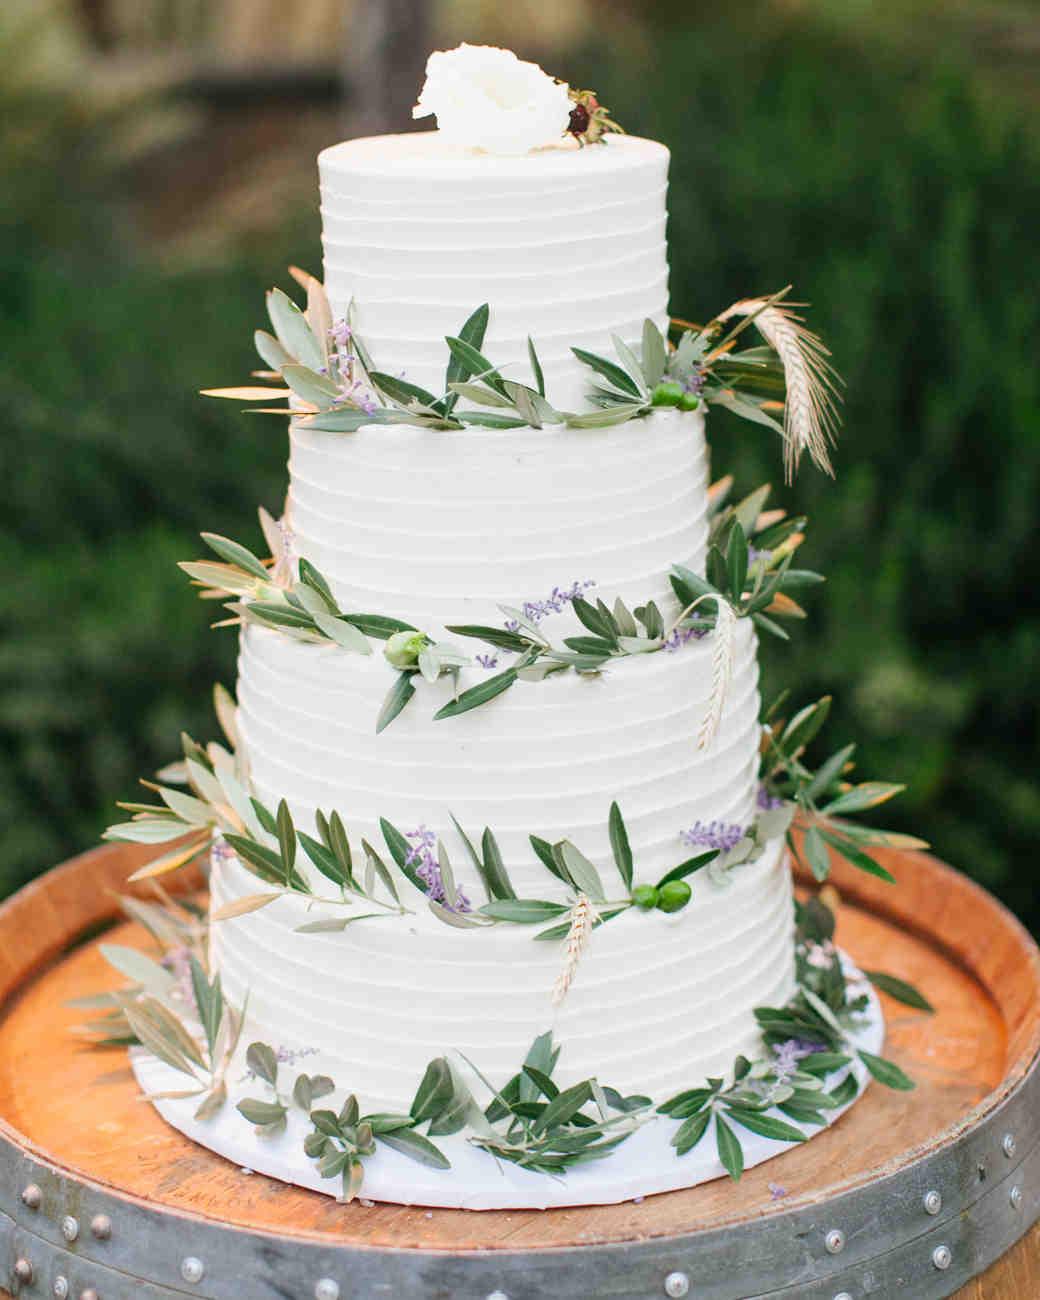 julia-dave-wedding-cake-0414.jpg